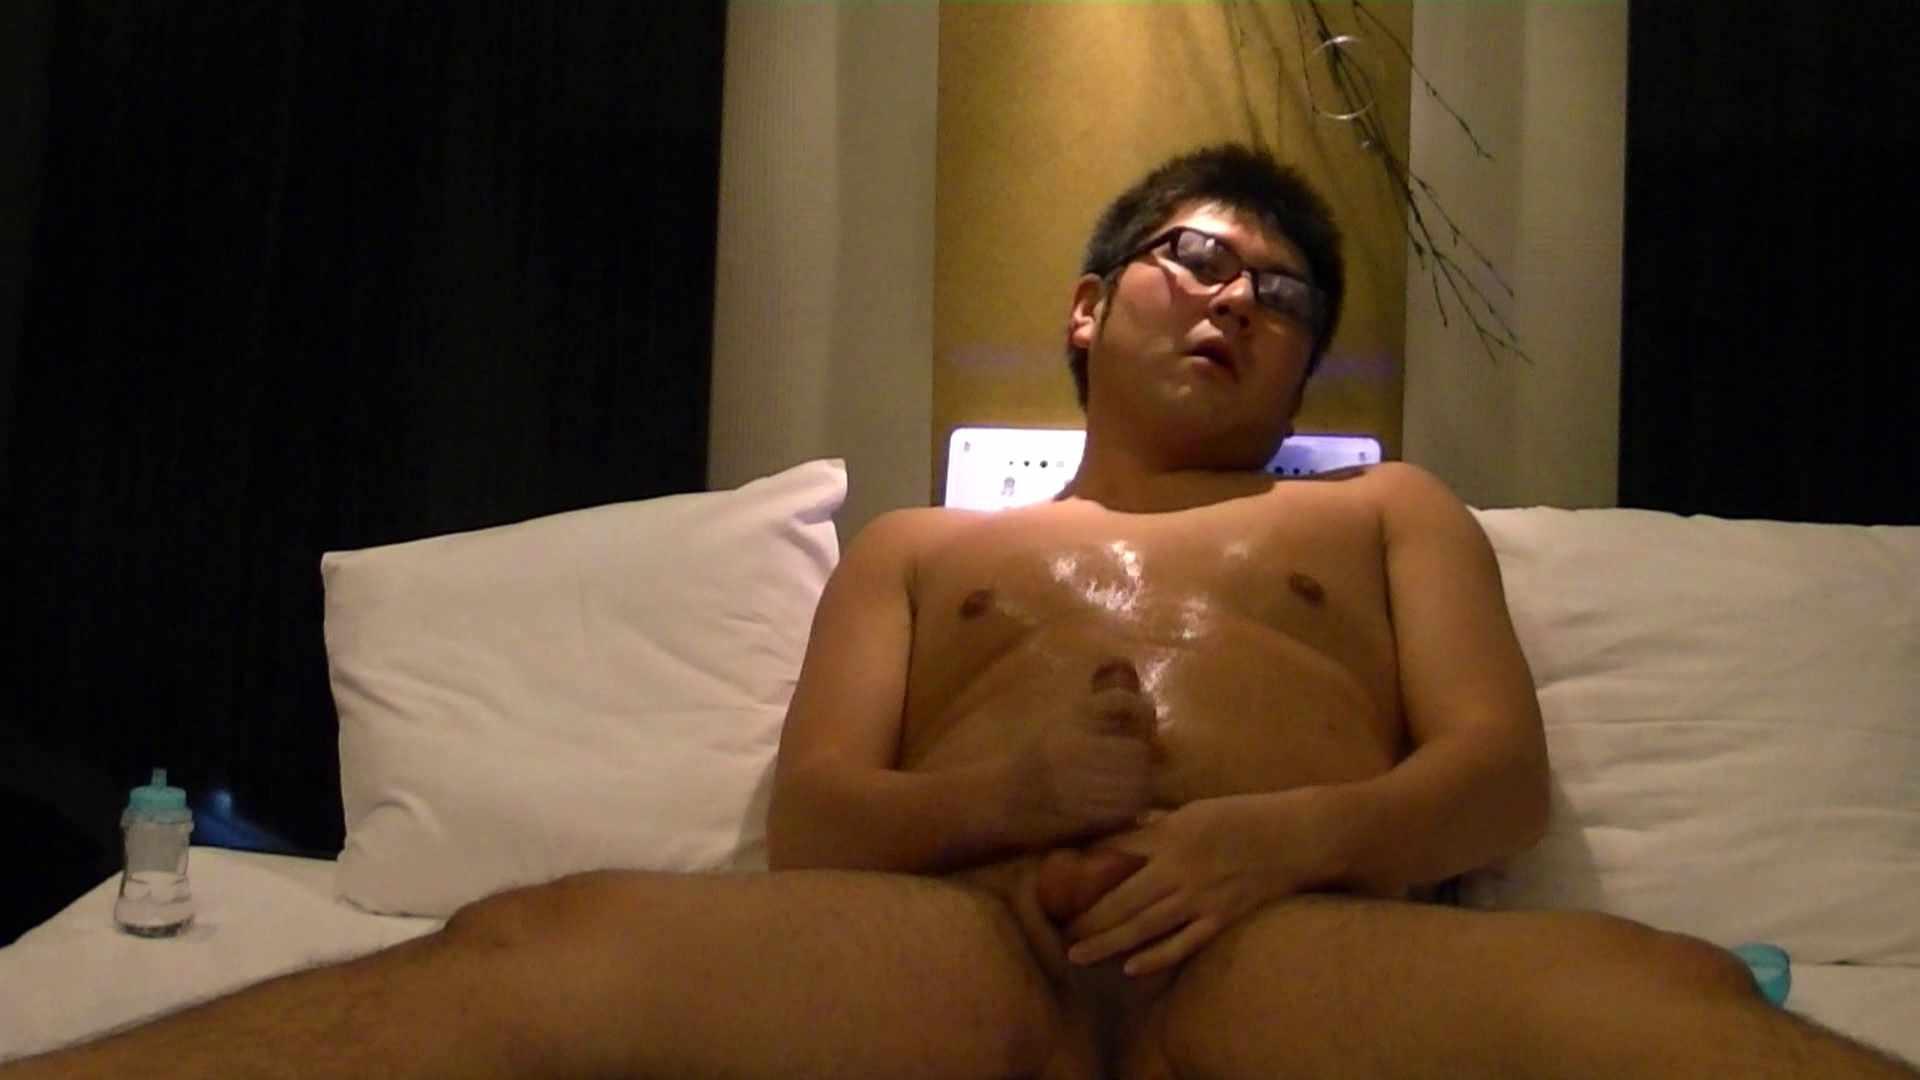 Mr.オナックスさん投稿!HD 貴方のオナニー三万円で撮影させてください。VOL.03 後編 投稿 ゲイ無修正ビデオ画像 106枚 27